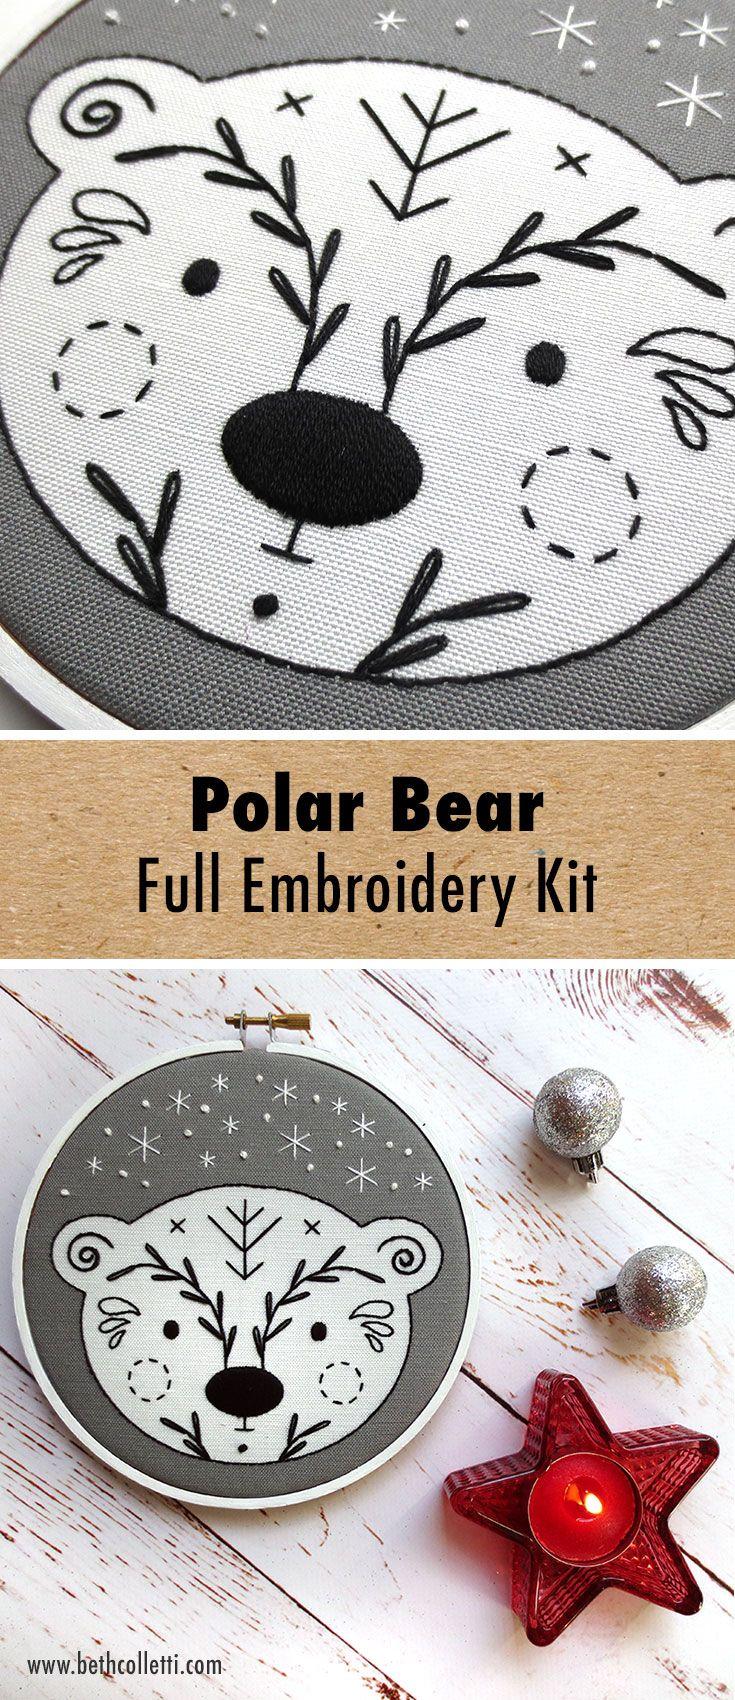 Cute Scandinavian style polar bear embroidery pattern for winter